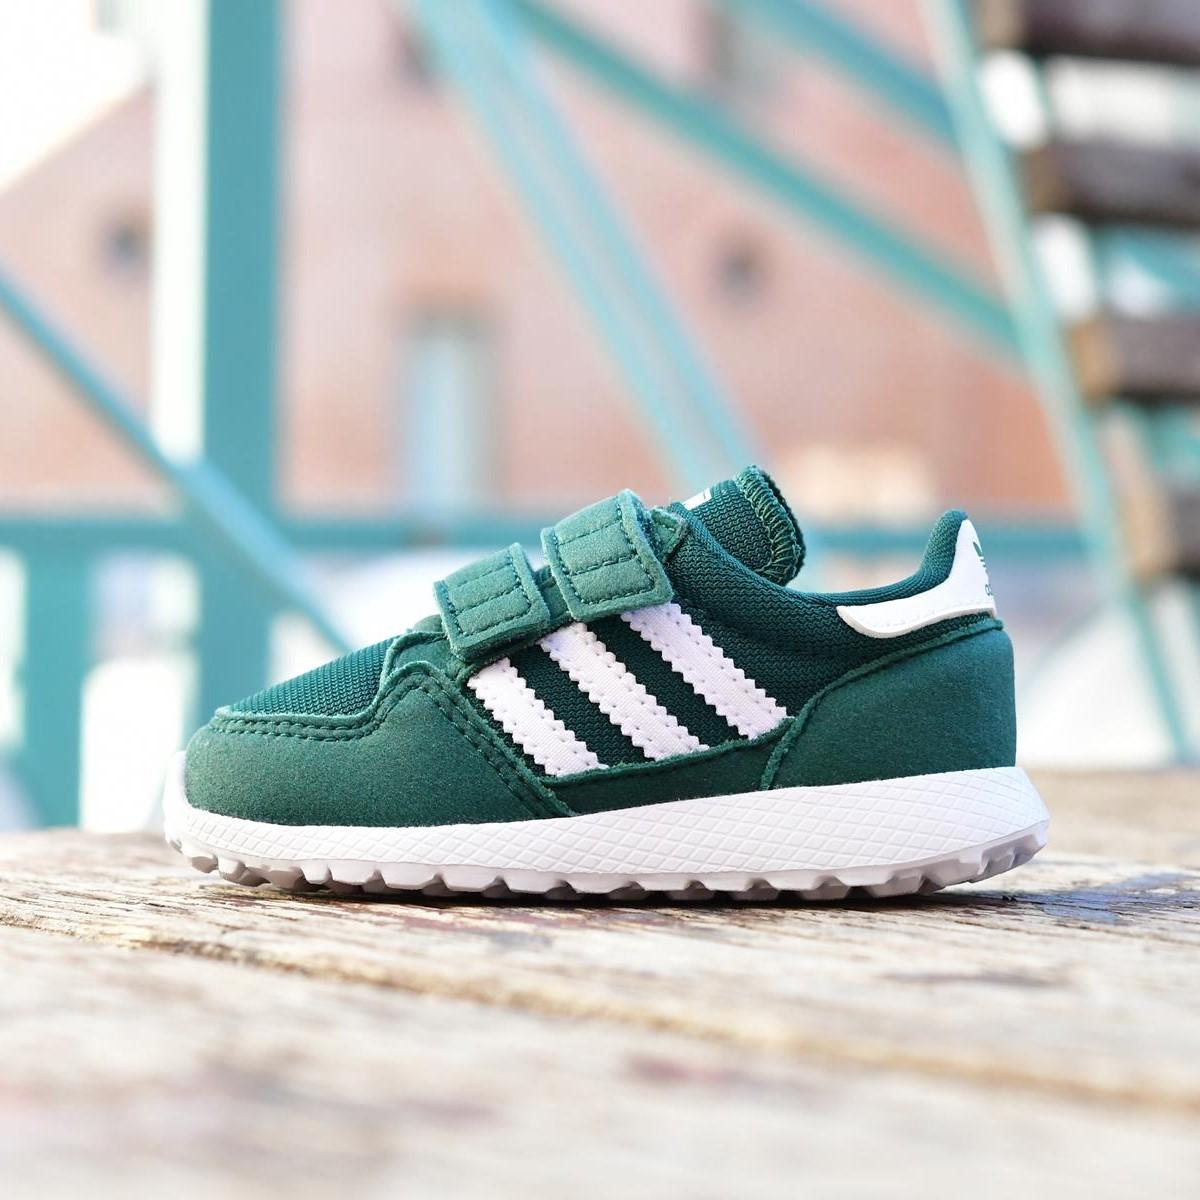 CG6824_AmorShoes-Adidas-Originals-Forest-Grove-Cf-i-oregon-niño-niña-Verde-collegiate-green-Footwear-white-CG6824